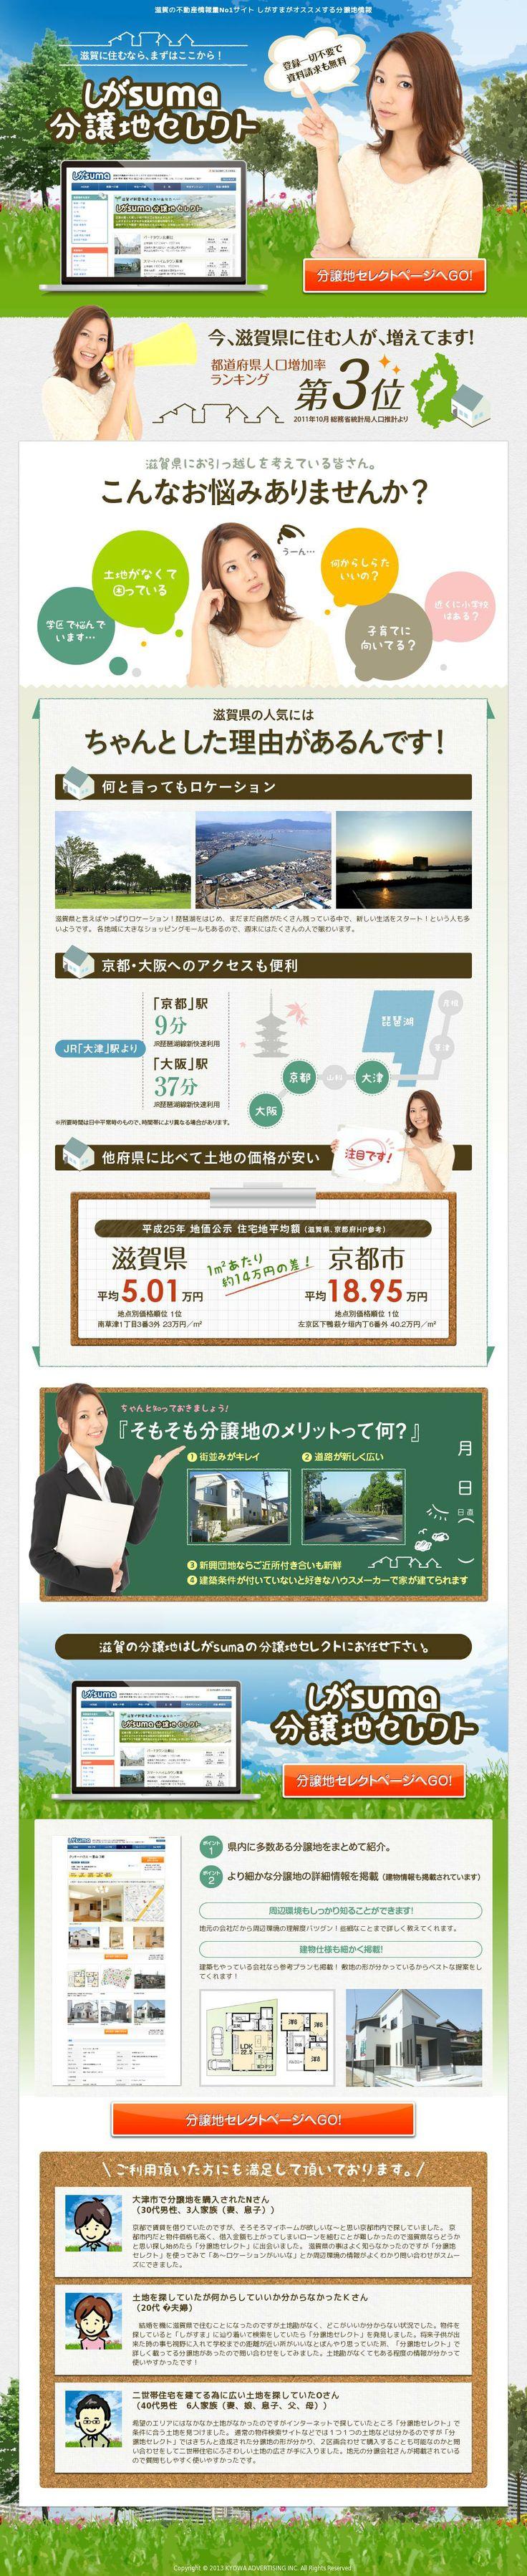 The website 'http://shigabunjyouchi.jp/' courtesy of @Pinstamatic (http://pinstamatic.com)